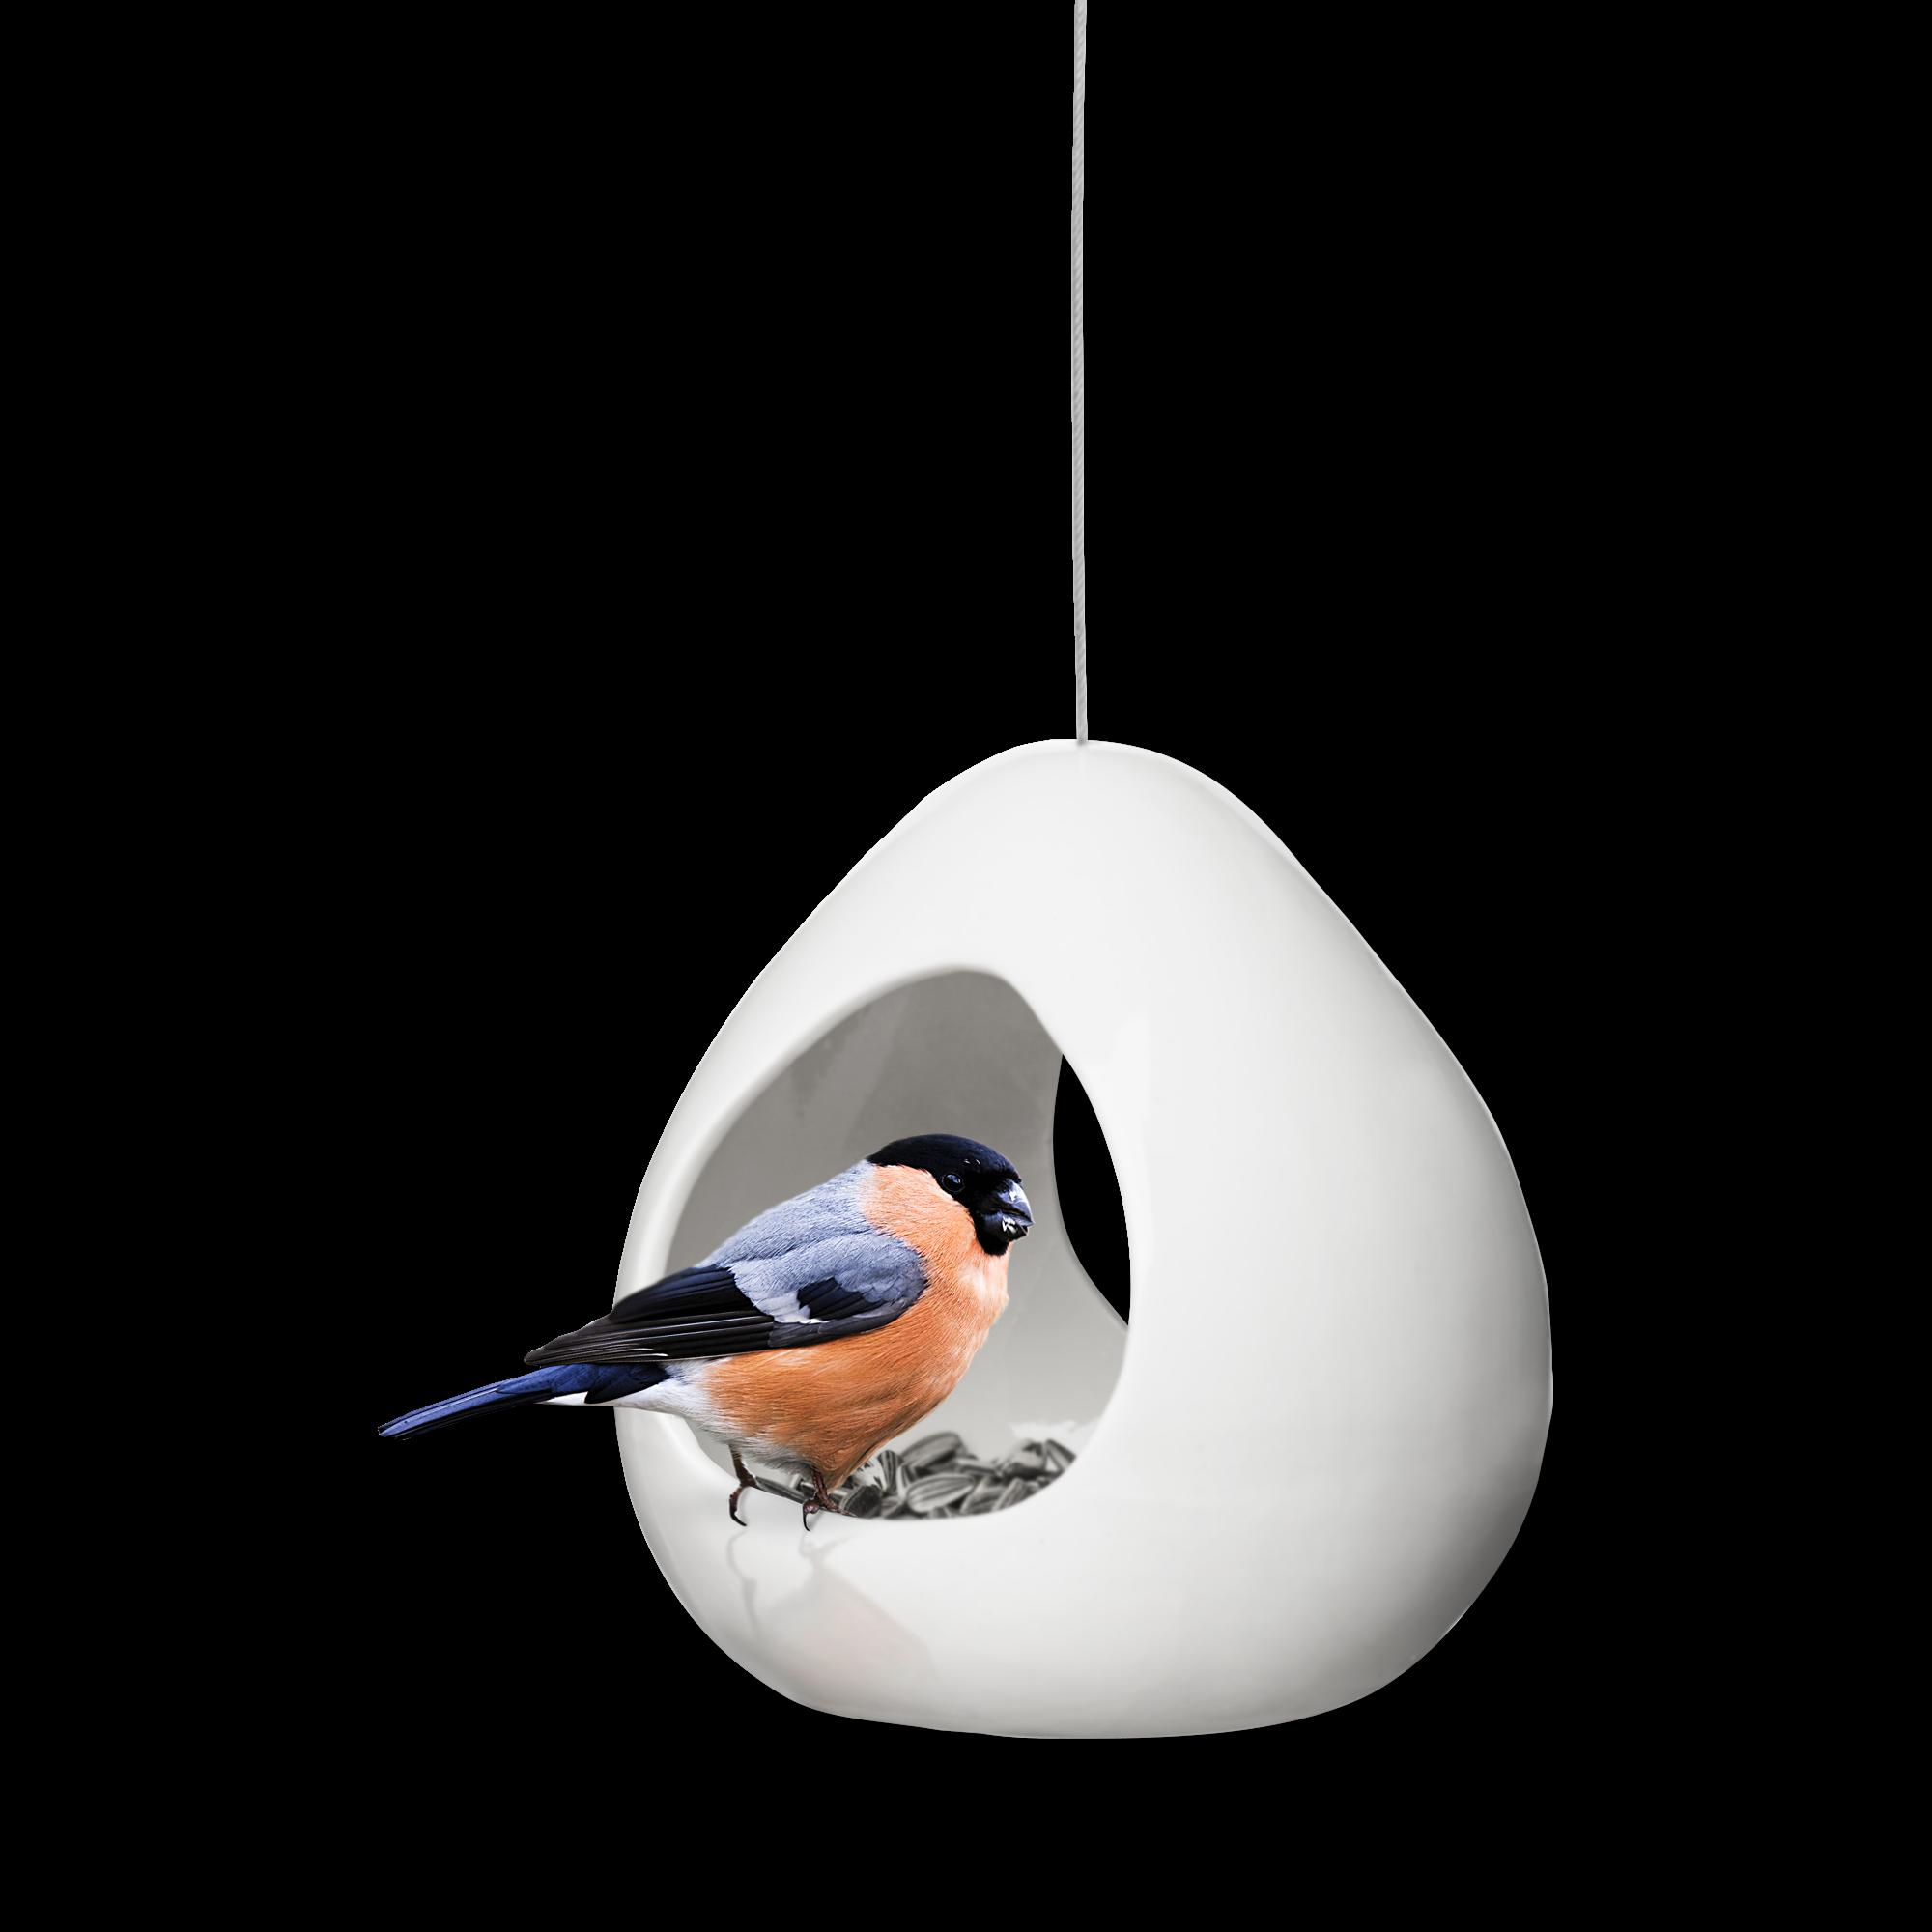 birdy-bird feeder-1